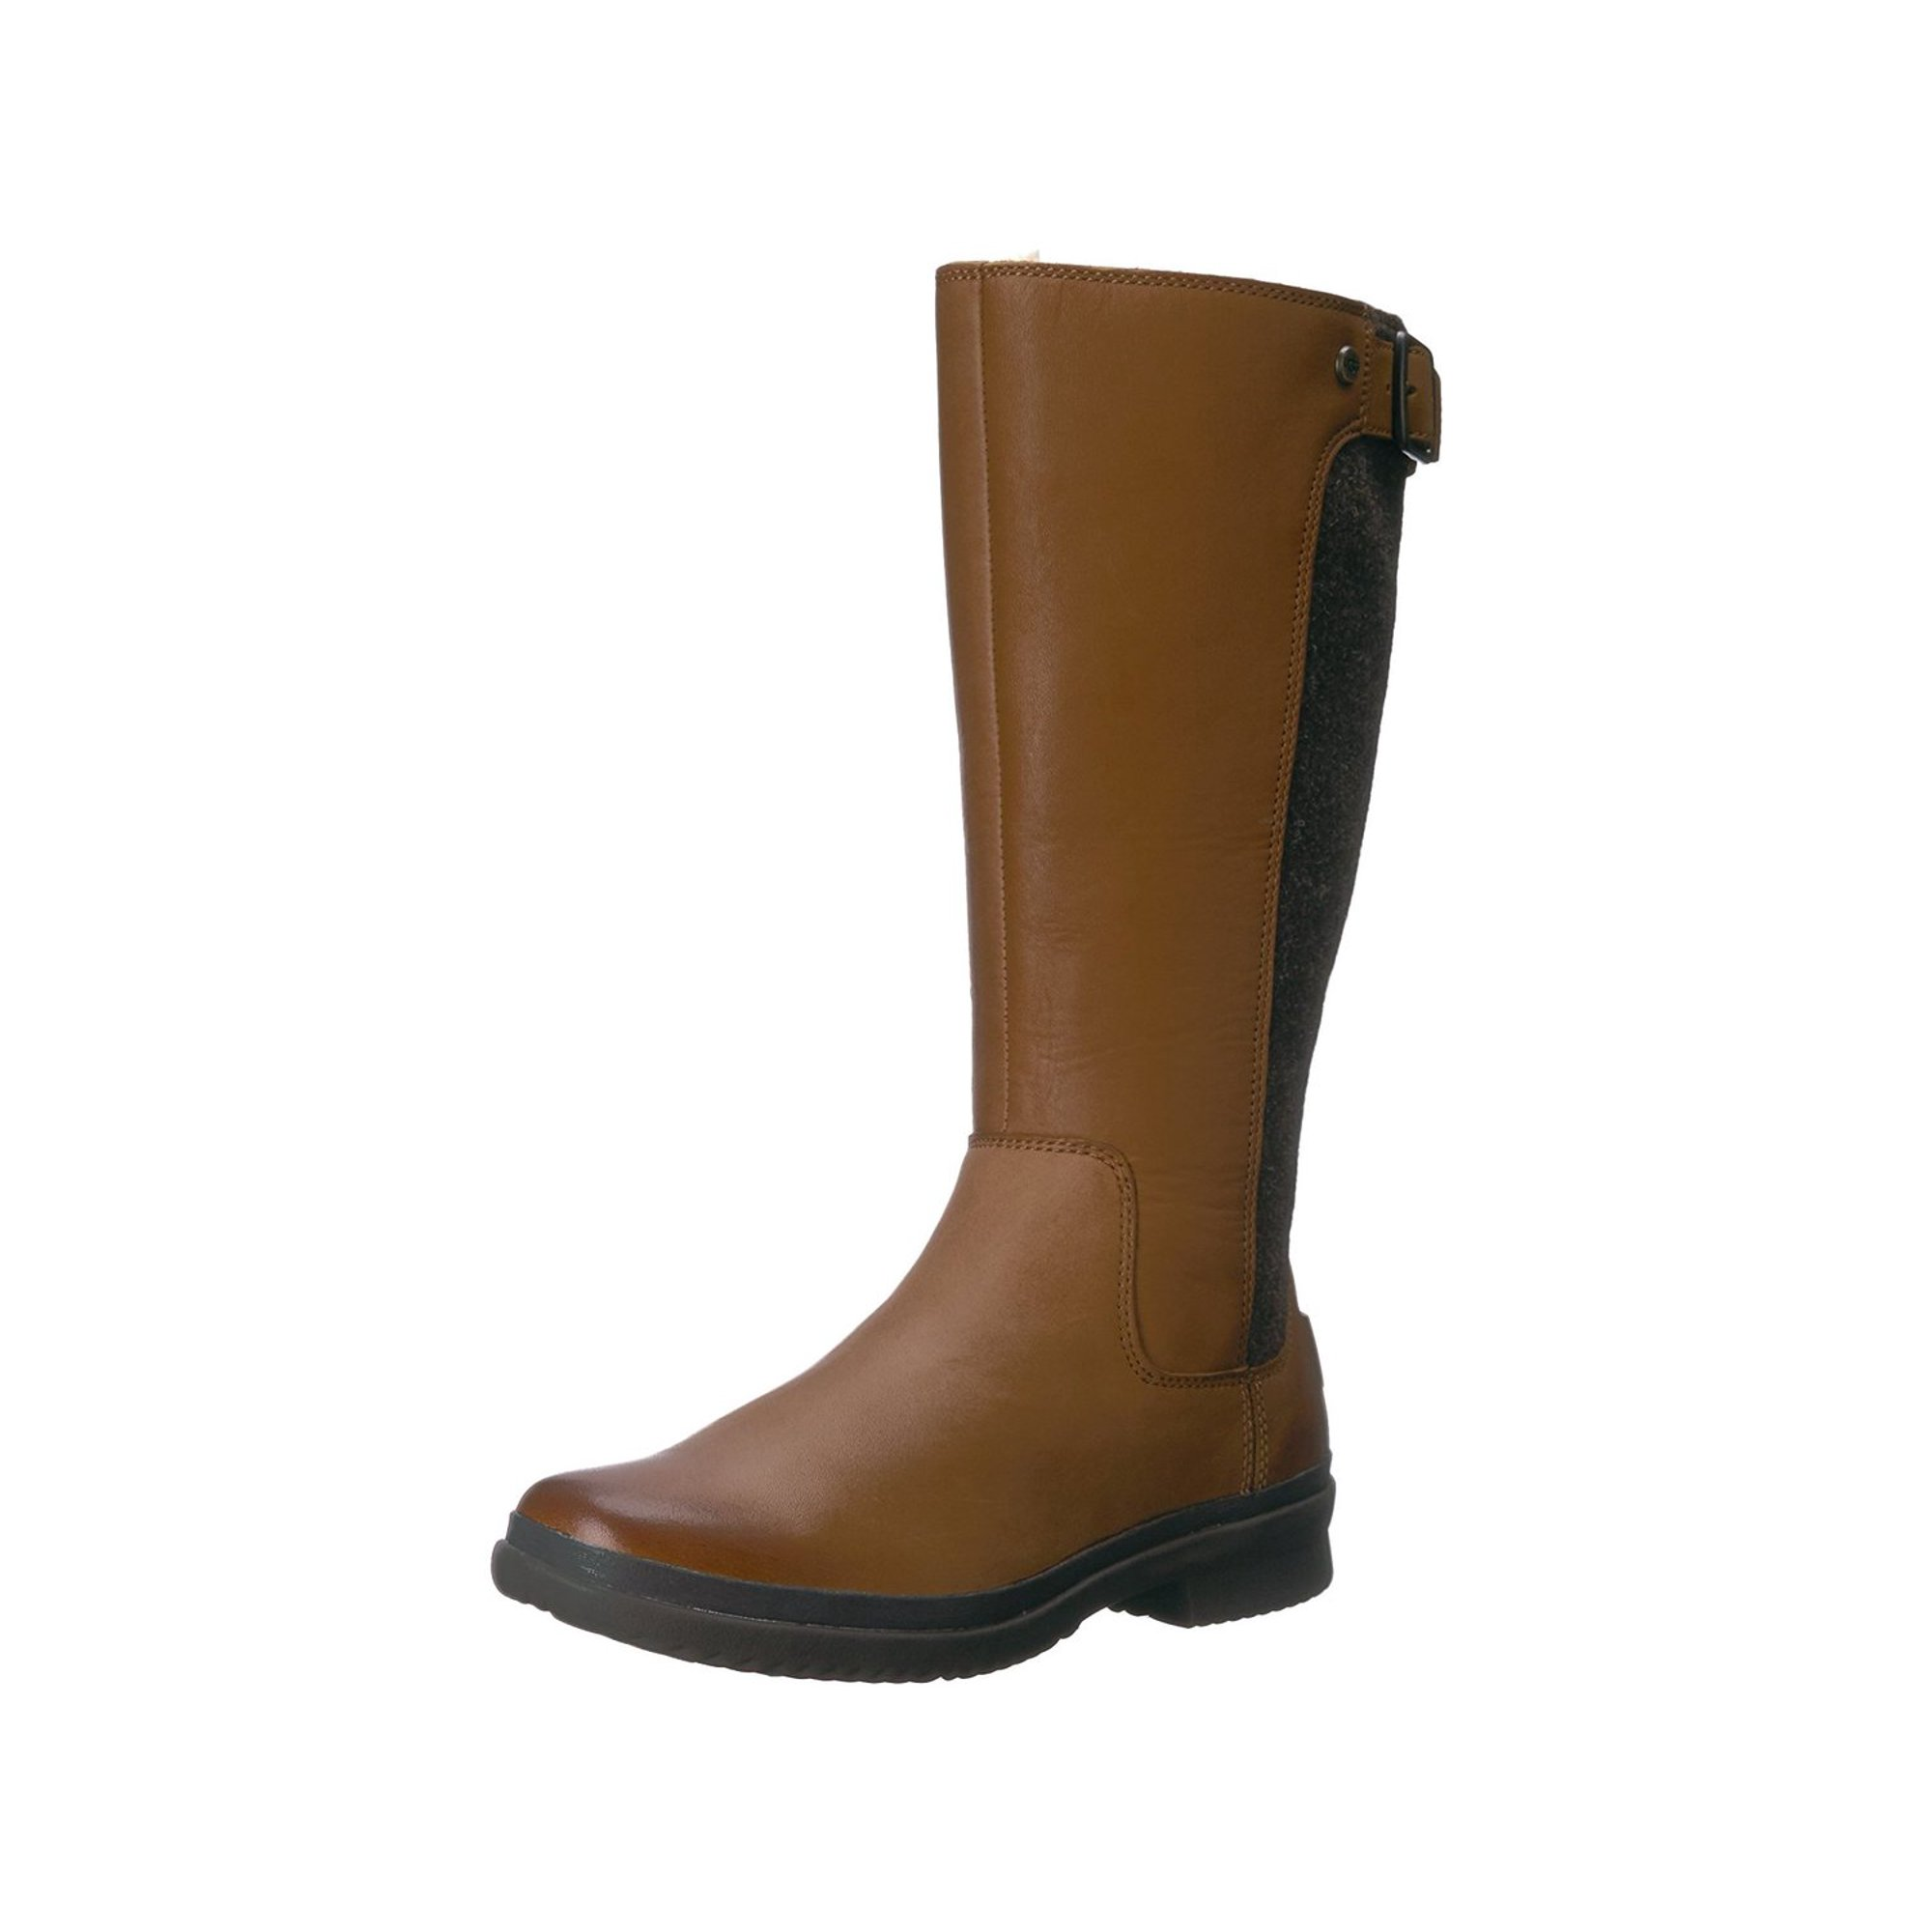 9c99077f70b Ugg Australia Womens Janina Leather Closed Toe Knee High ...